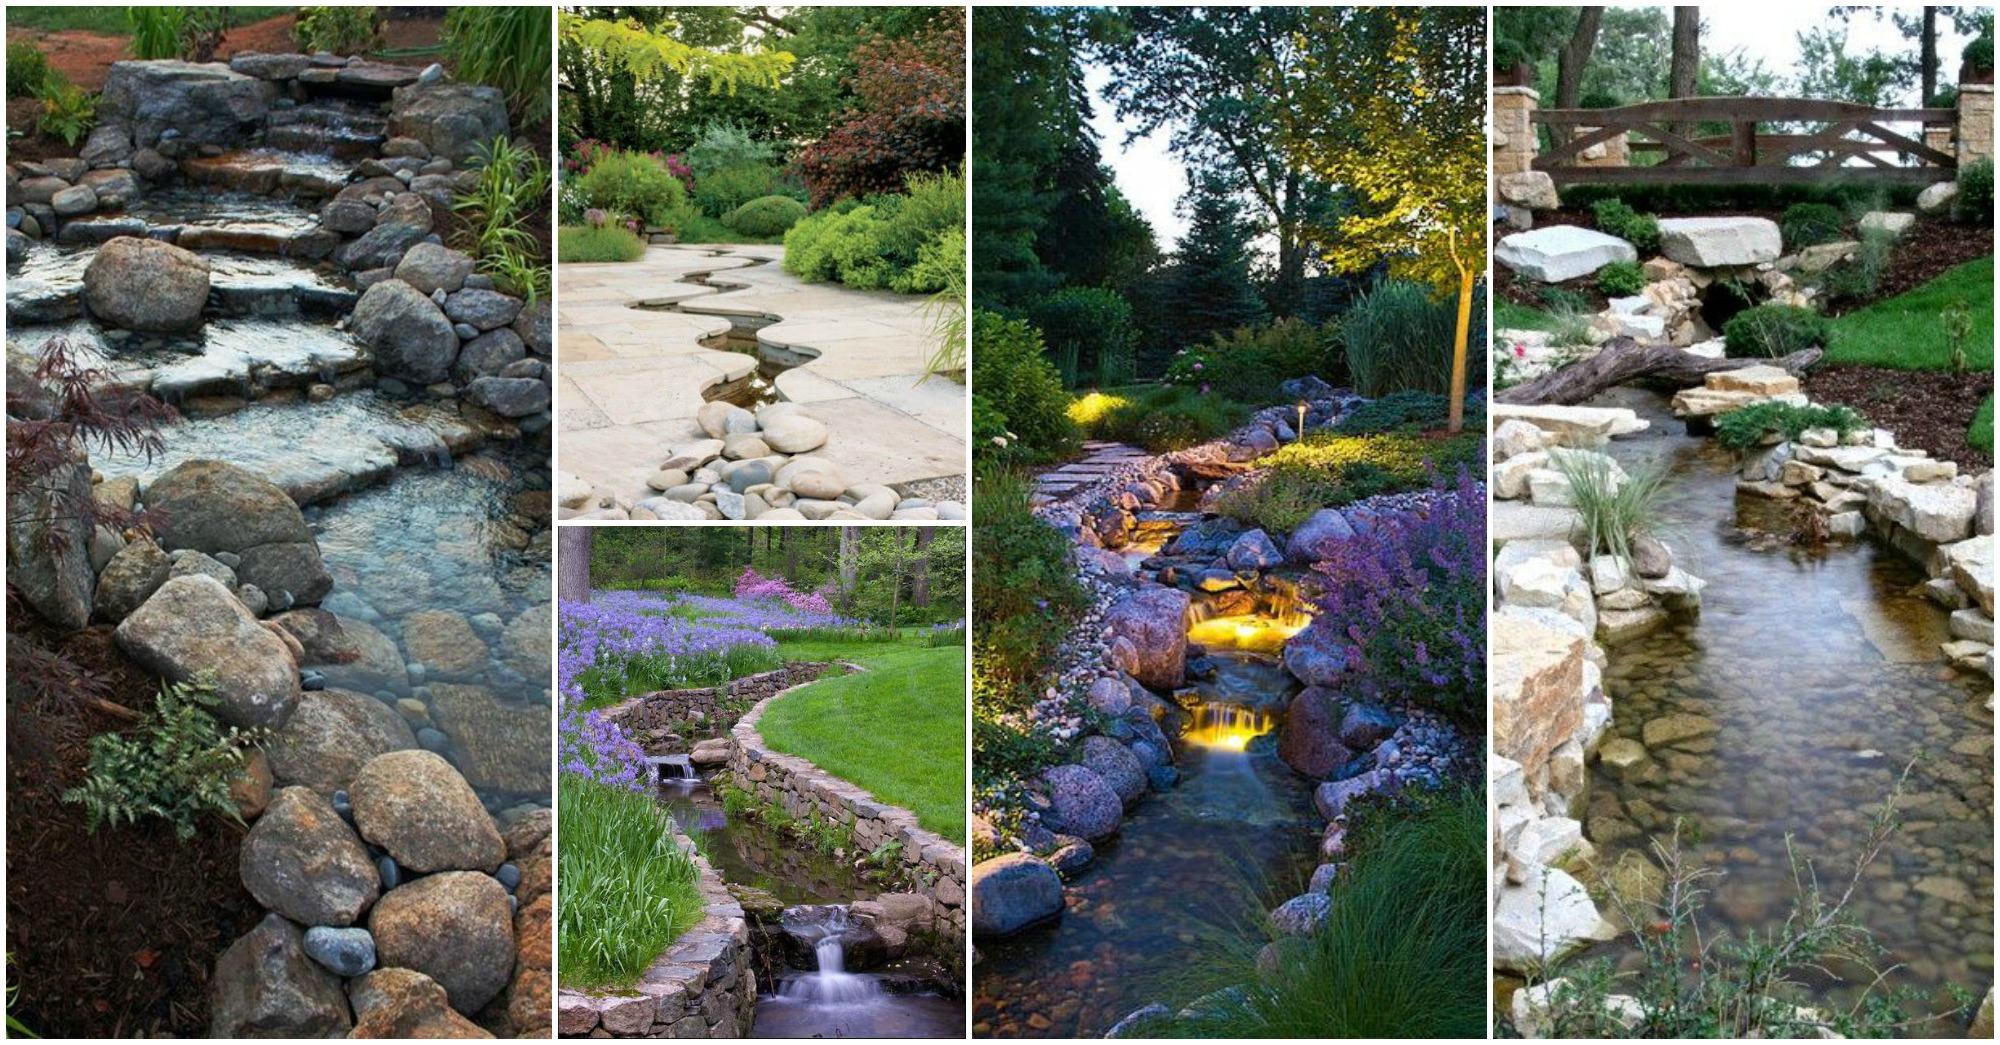 20 Outstanding Natural Garden Stream Designs That Will ... on Backyard Stream Ideas id=39291